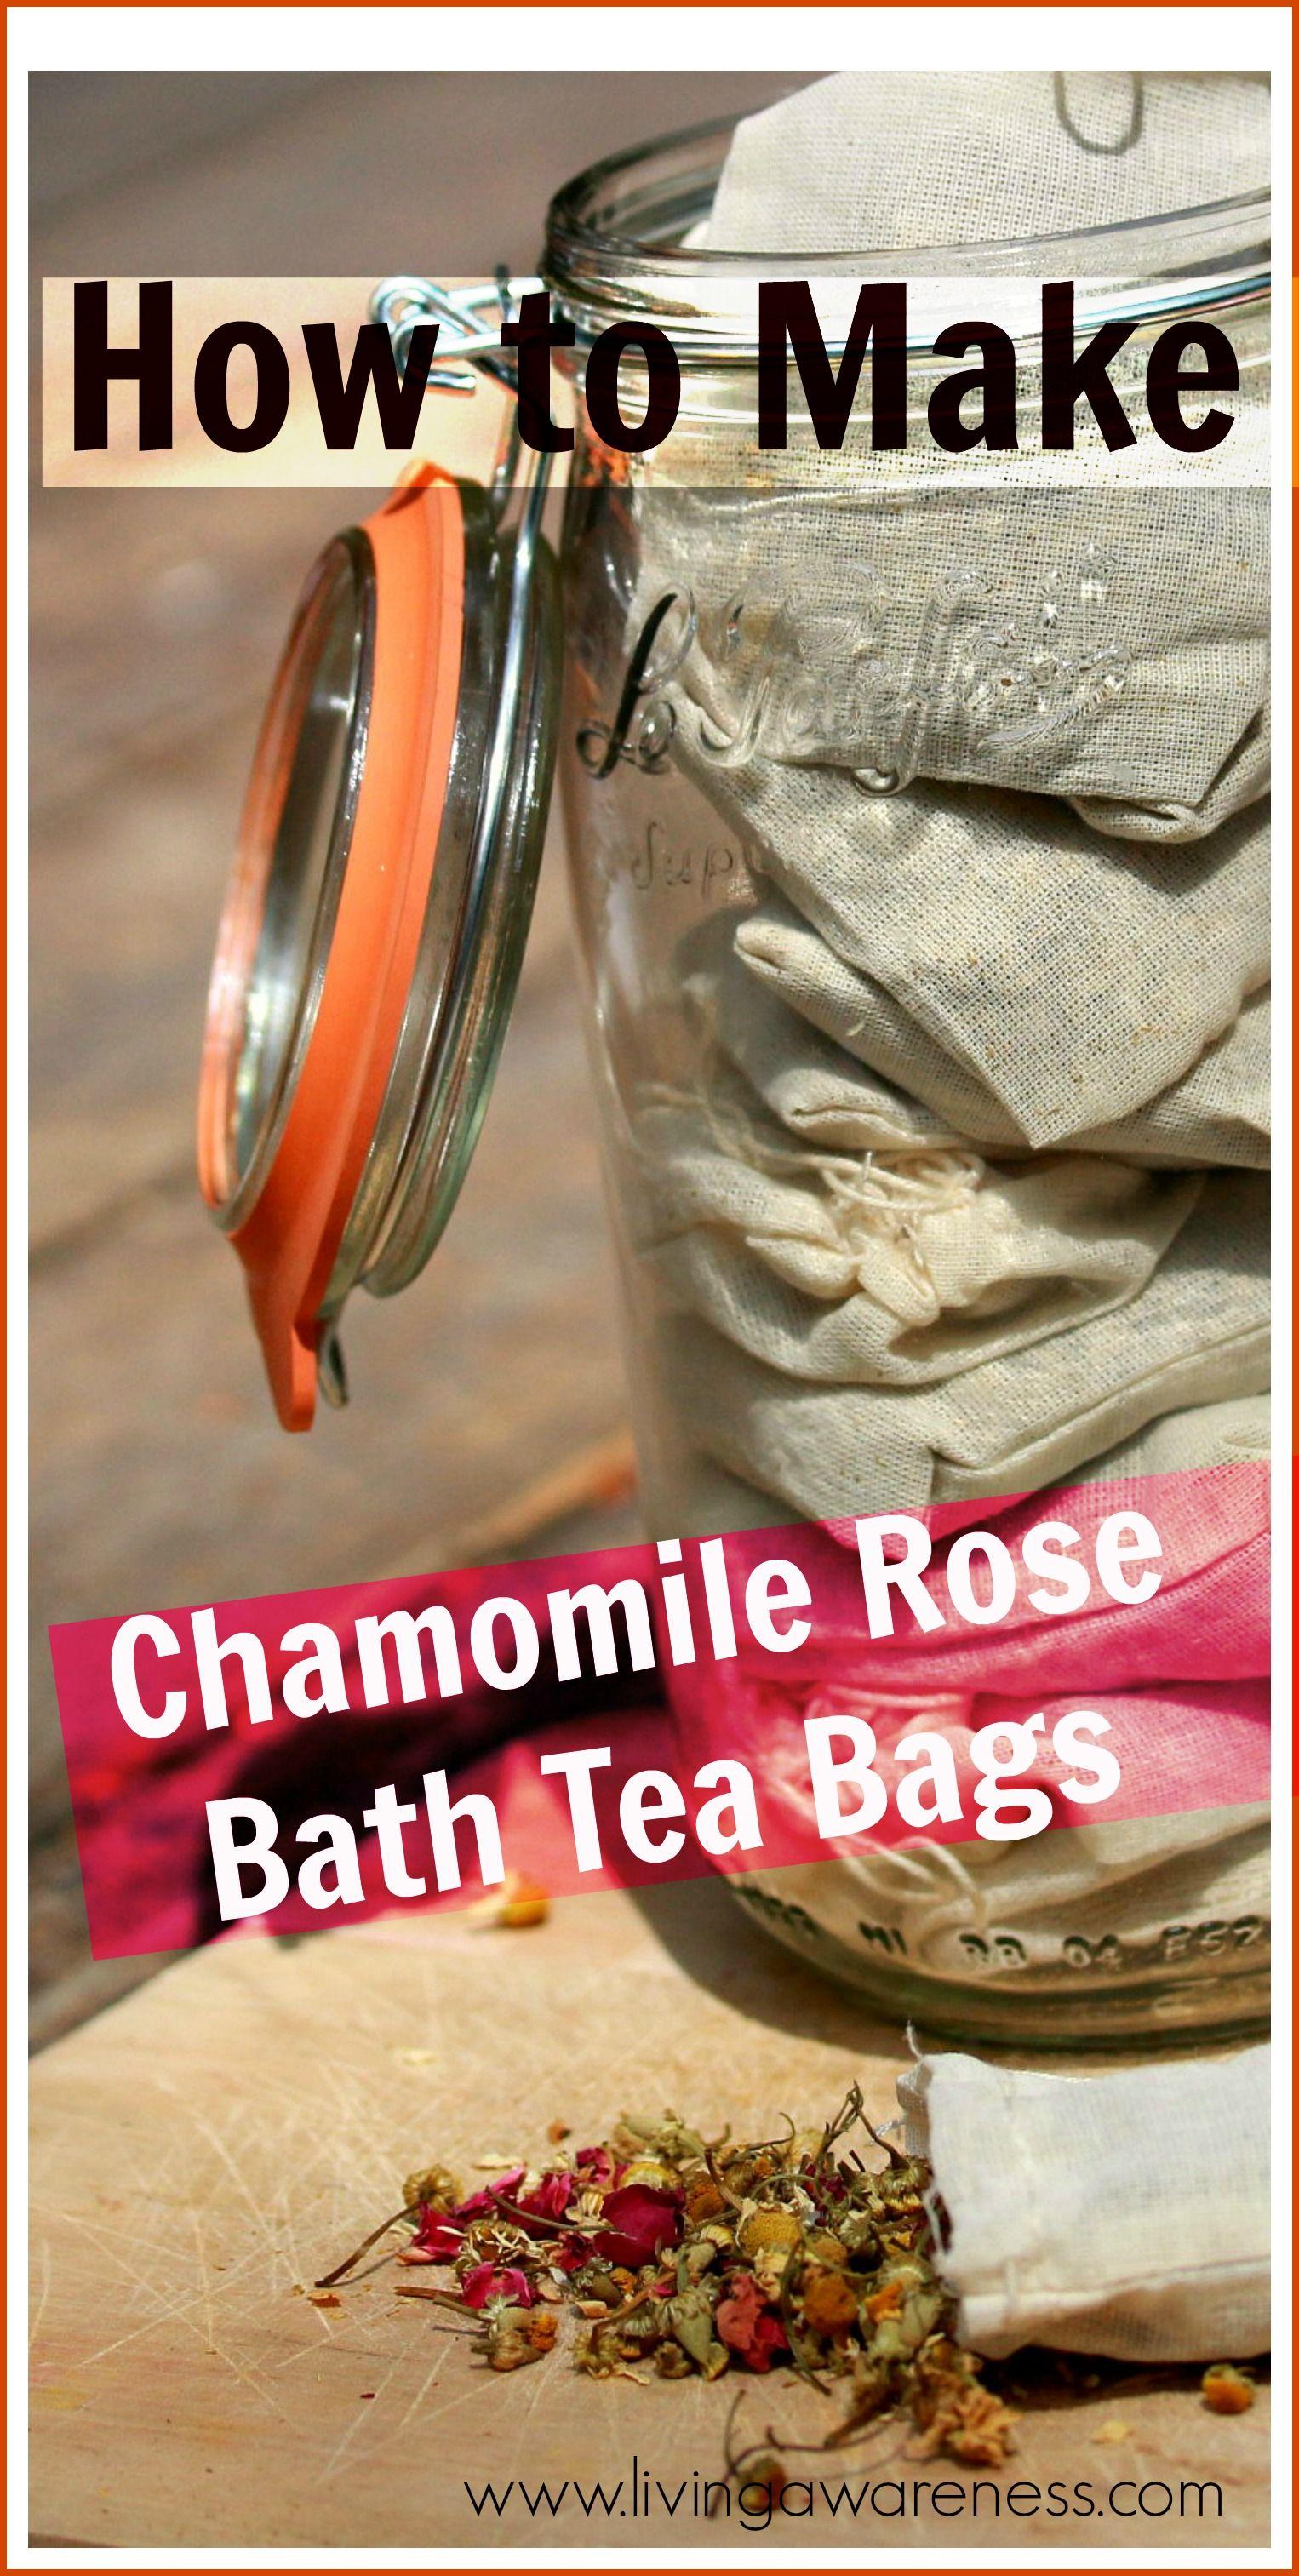 How to make herbal bath tea bags plus a rose chamomile